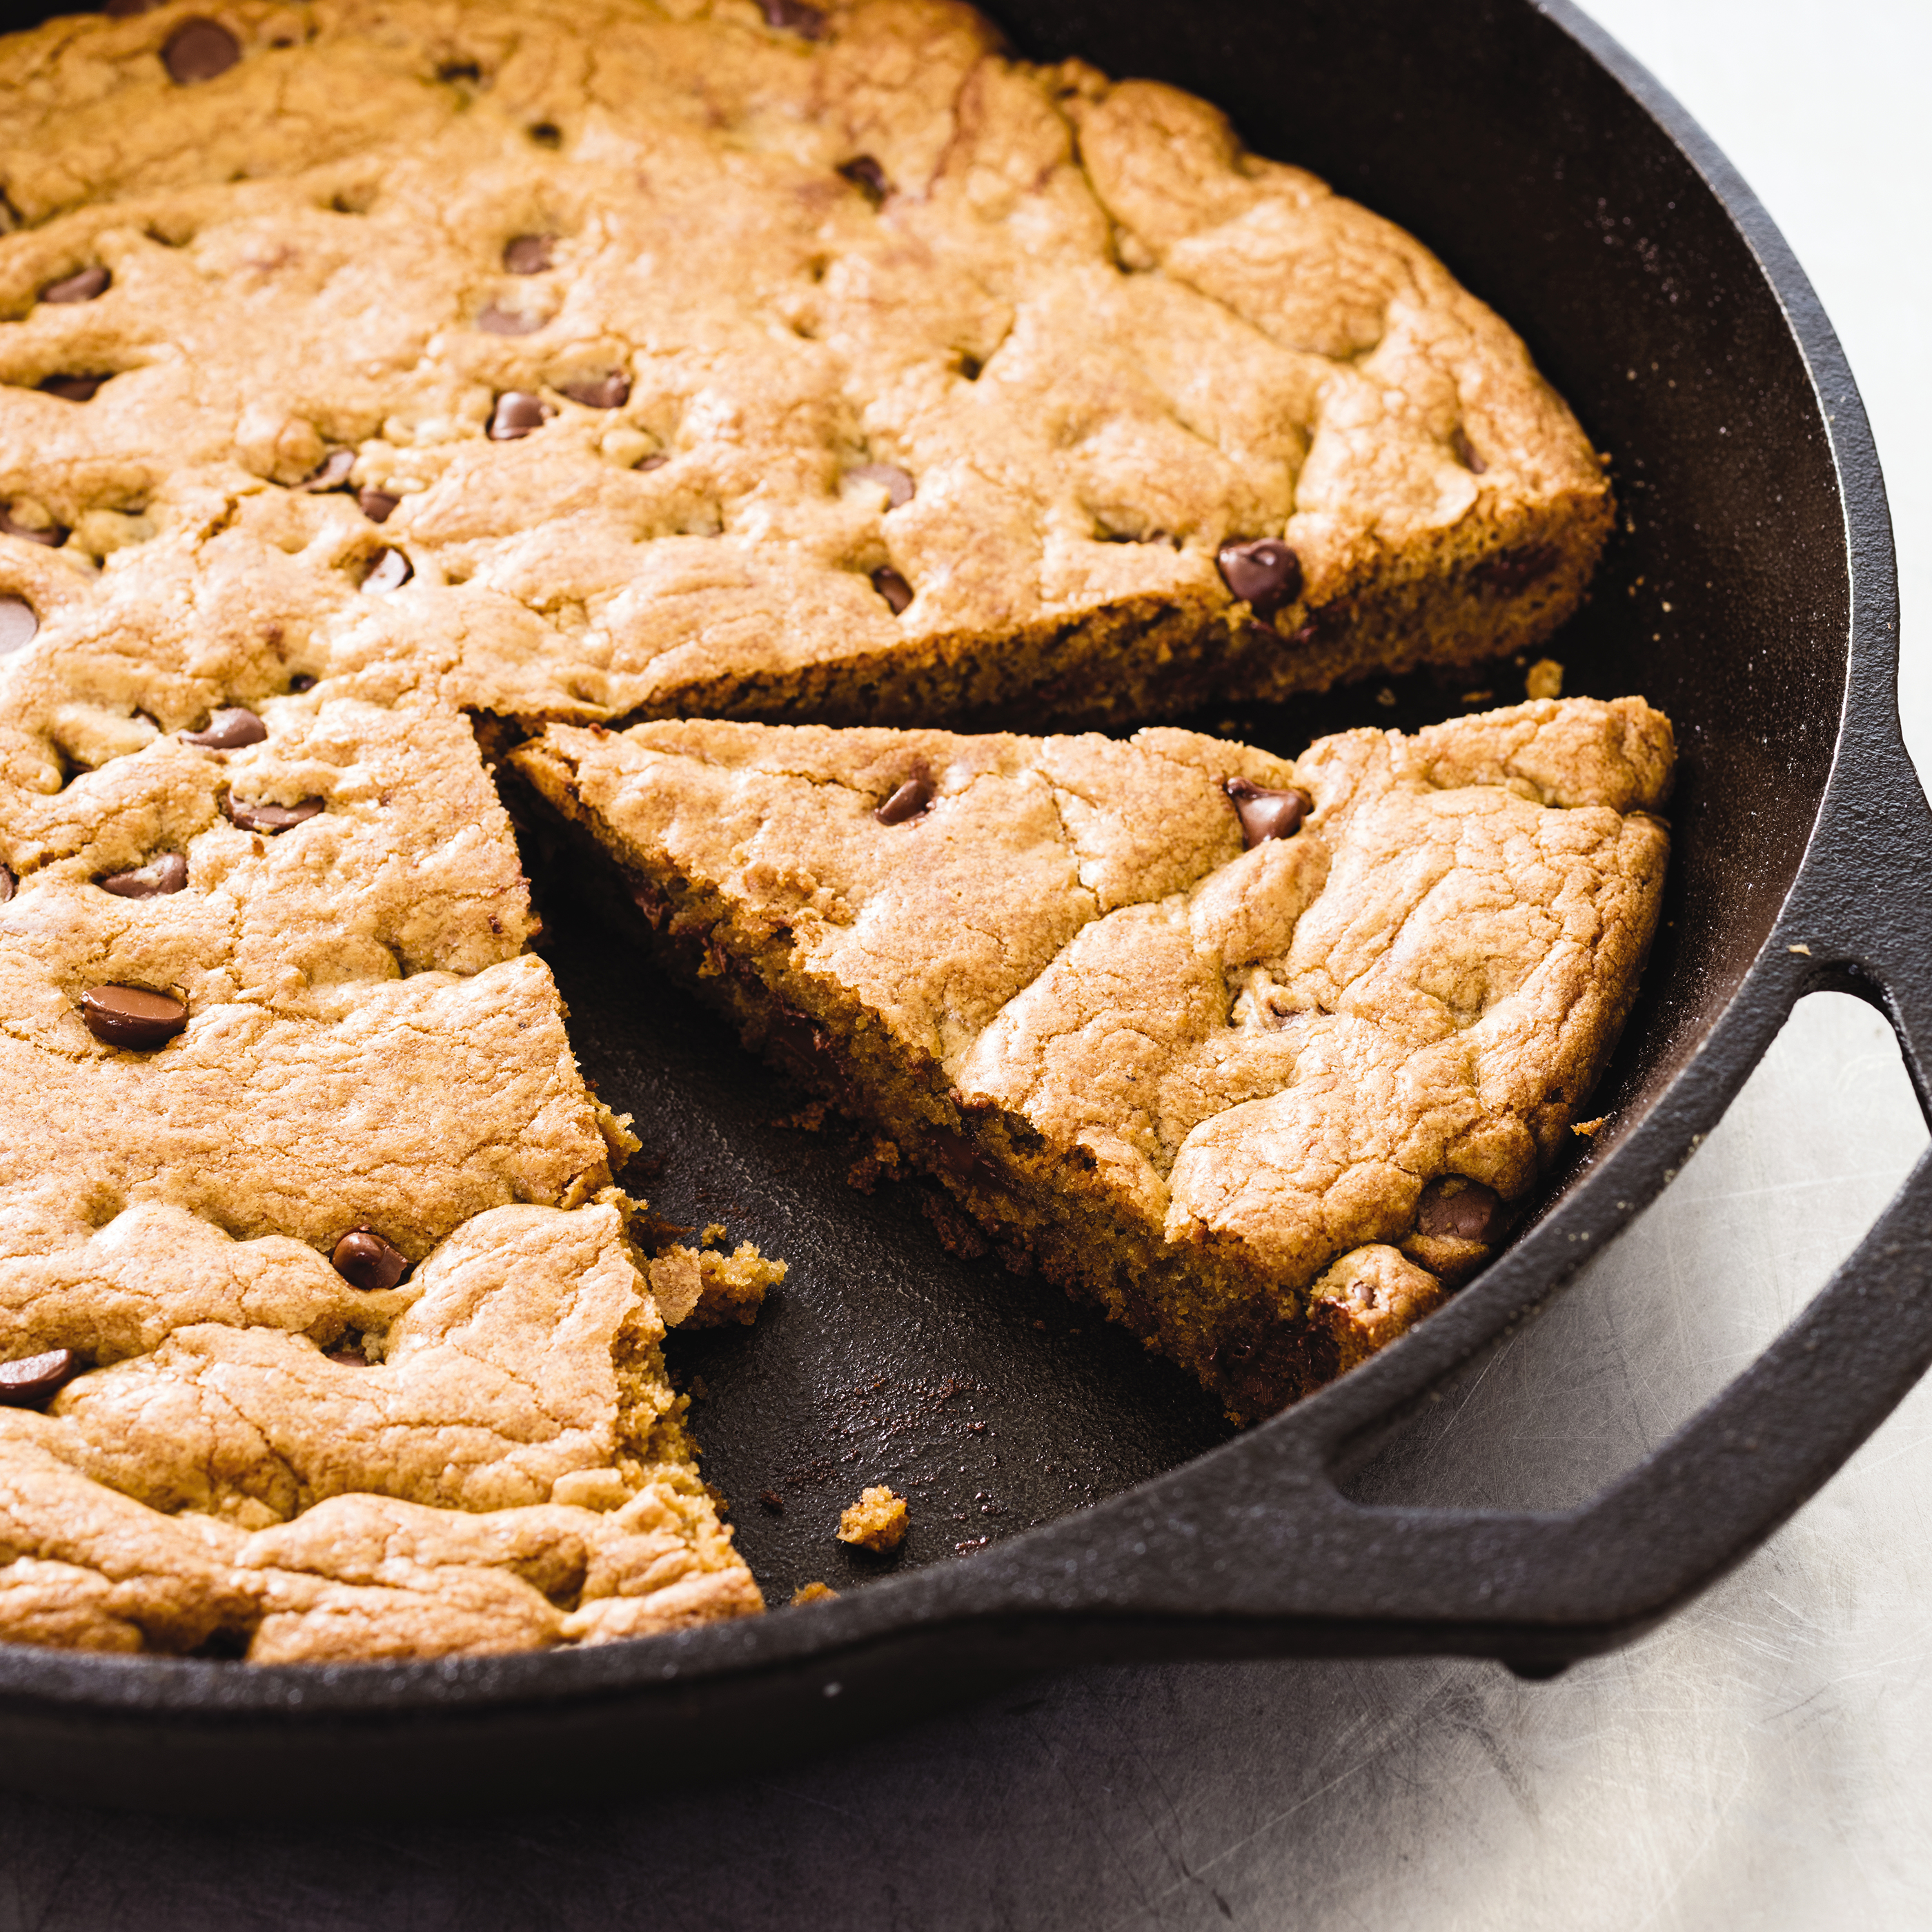 Cast Iron Skillet Chocolate Chip Cookie Americas Test Kitchen